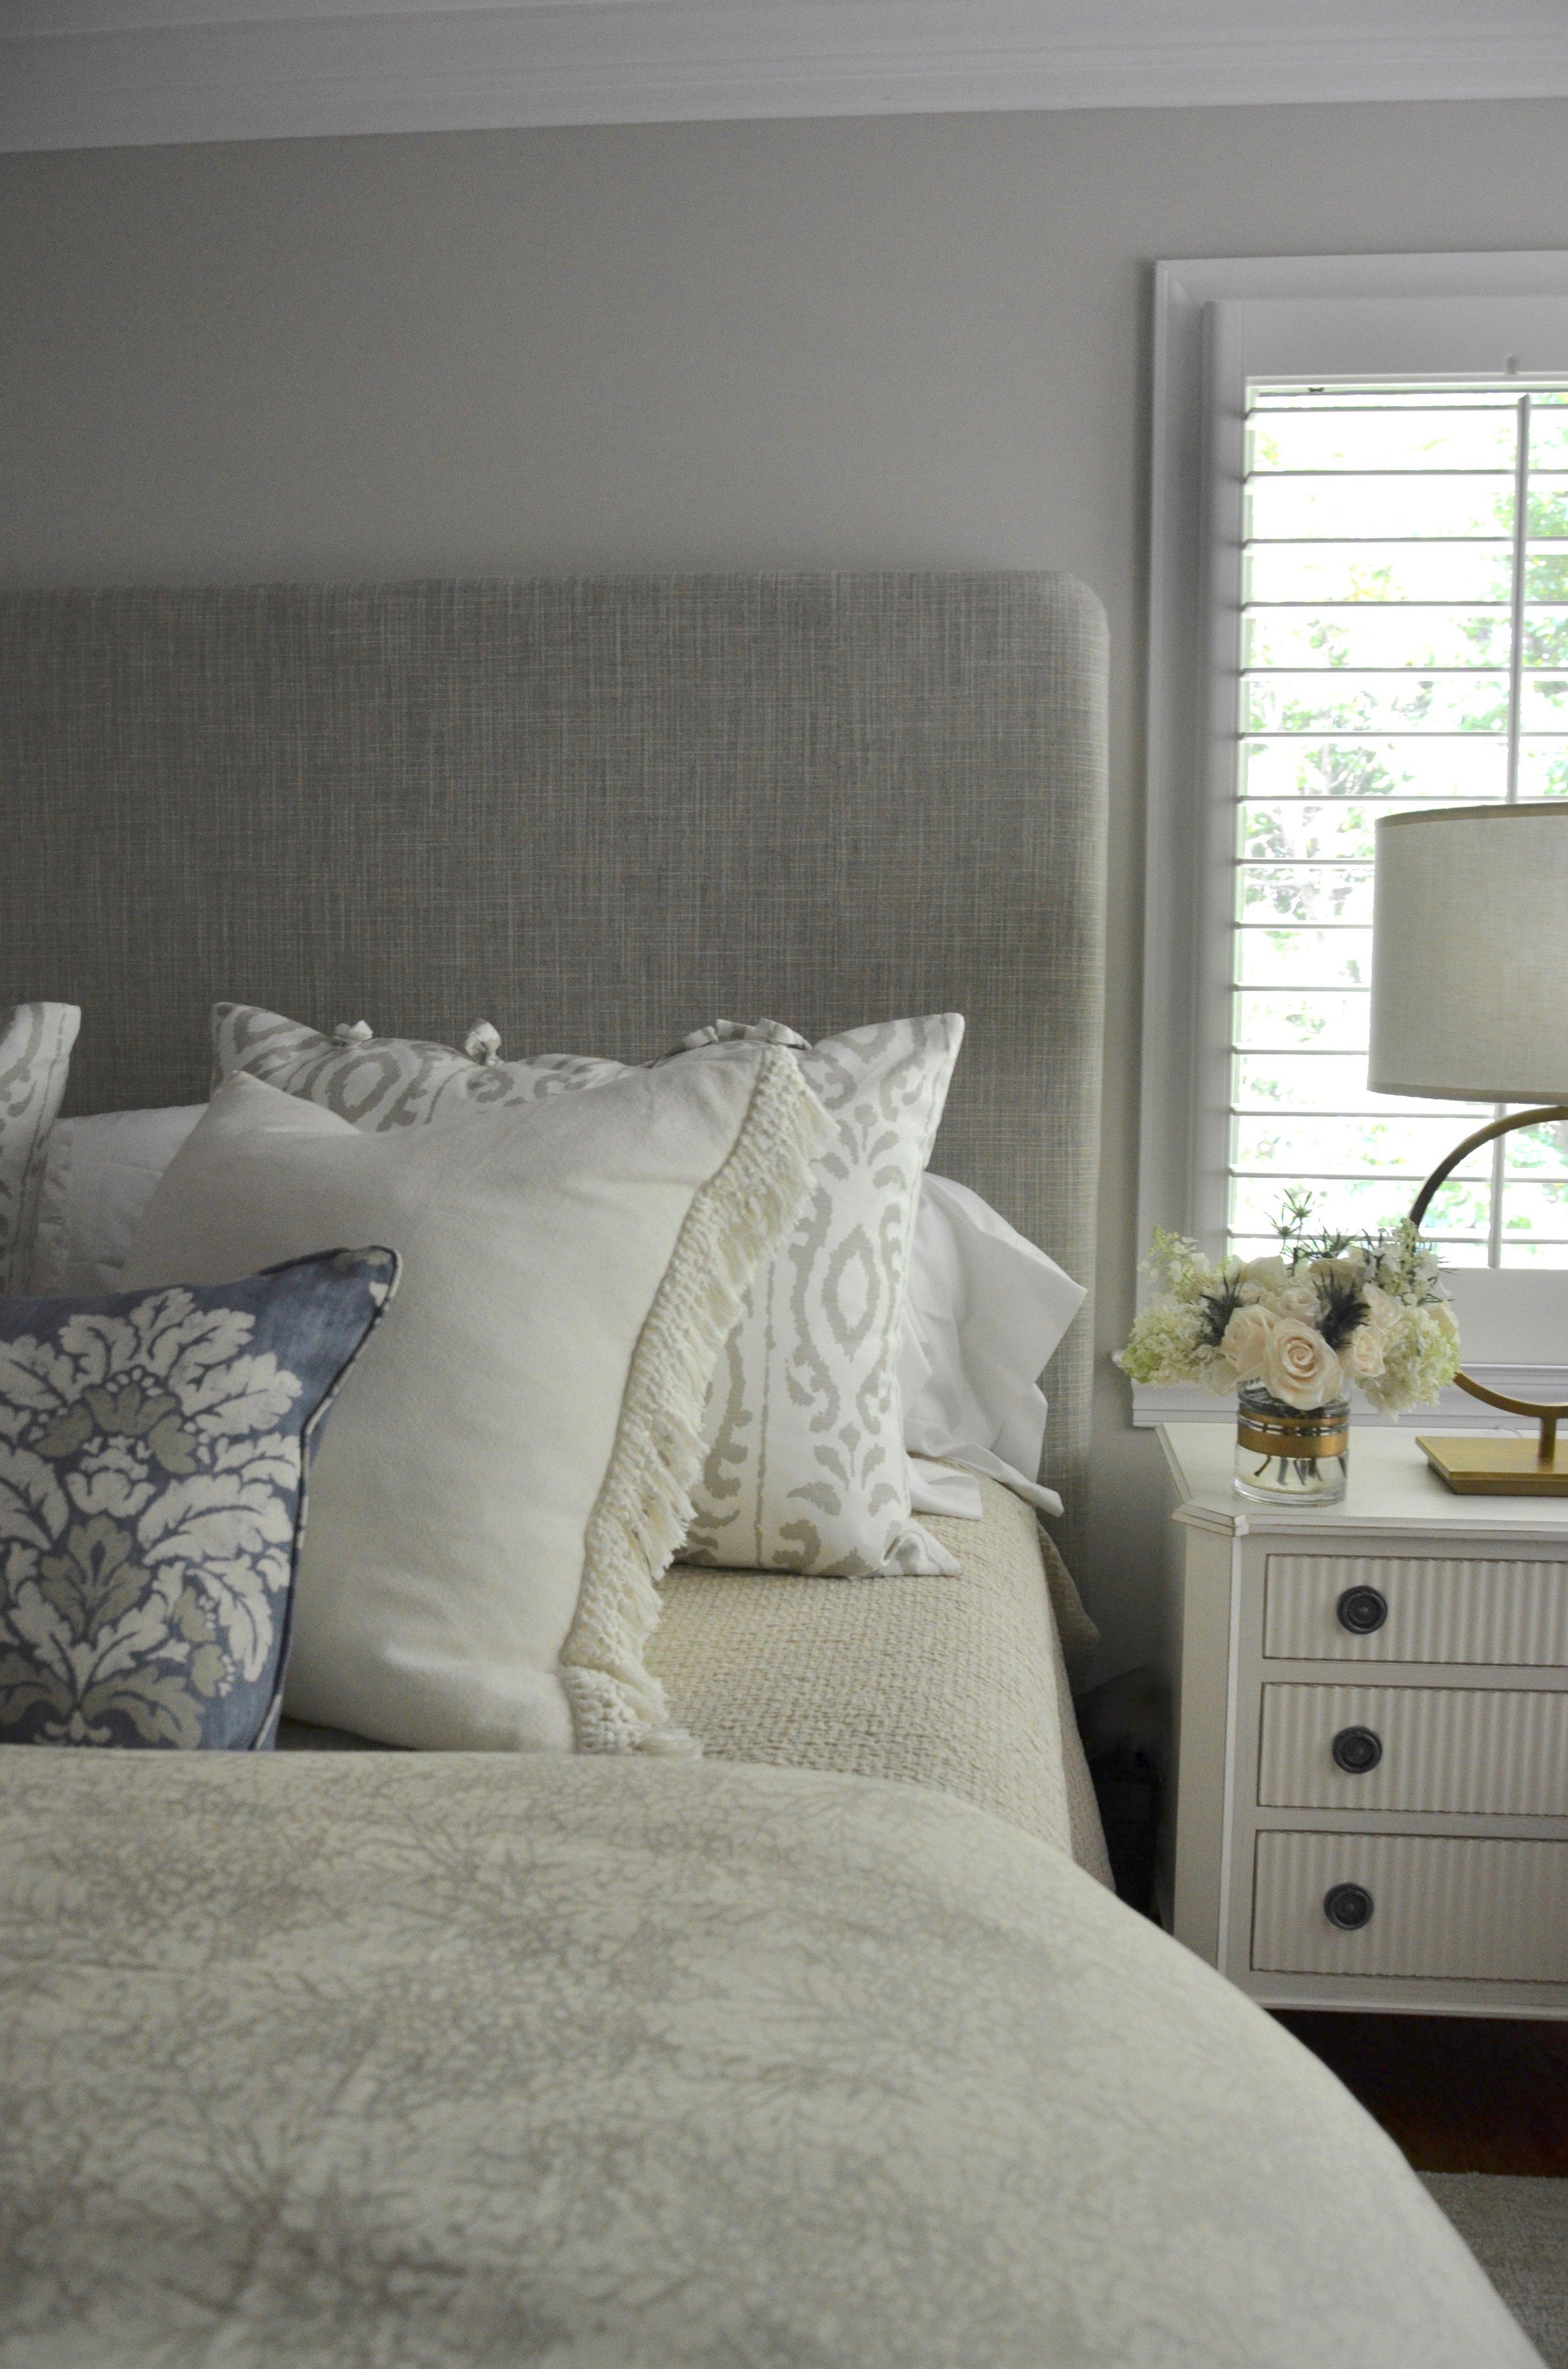 Master Bedroom Re Design in McLean, VA by Valerianne of DC